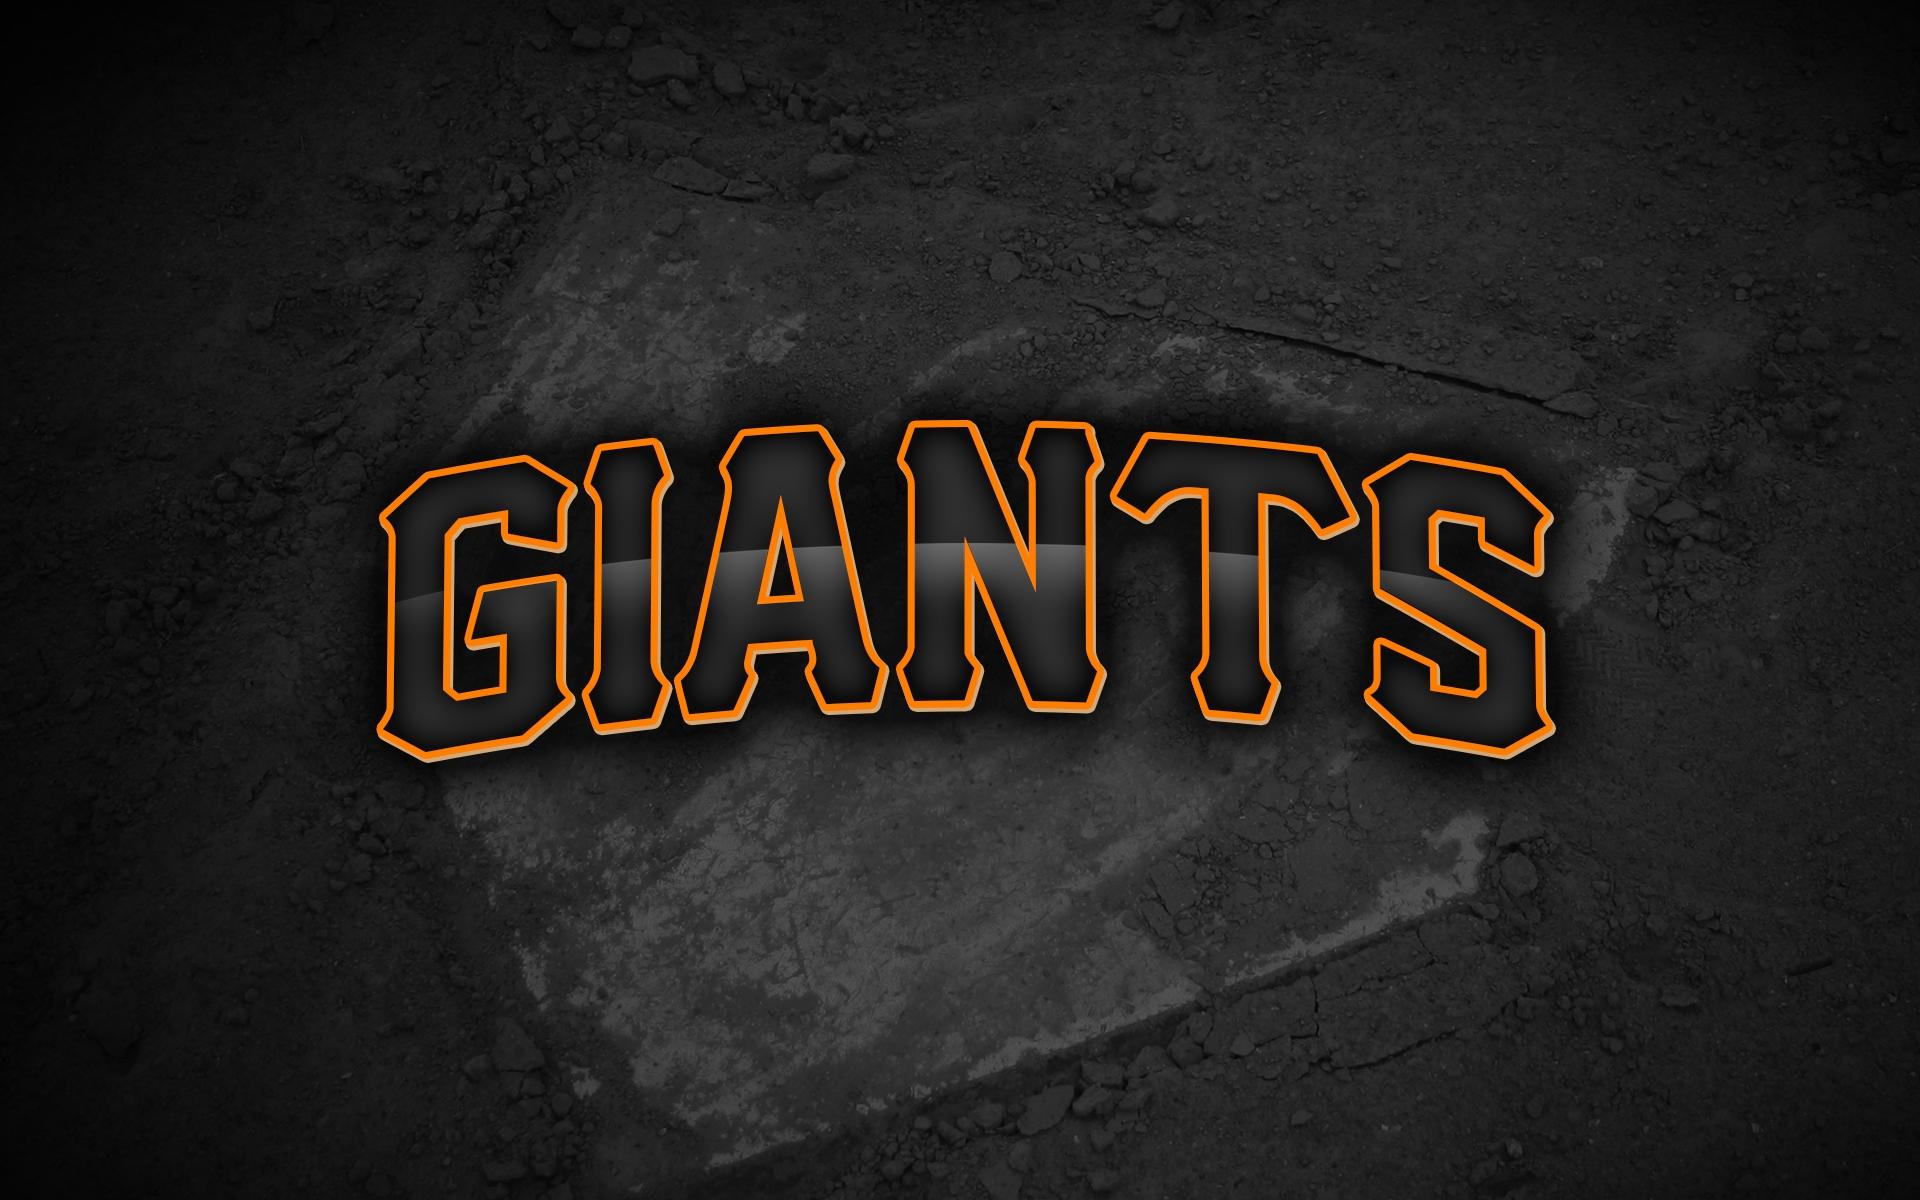 sf giants backgrounds | pixelstalk